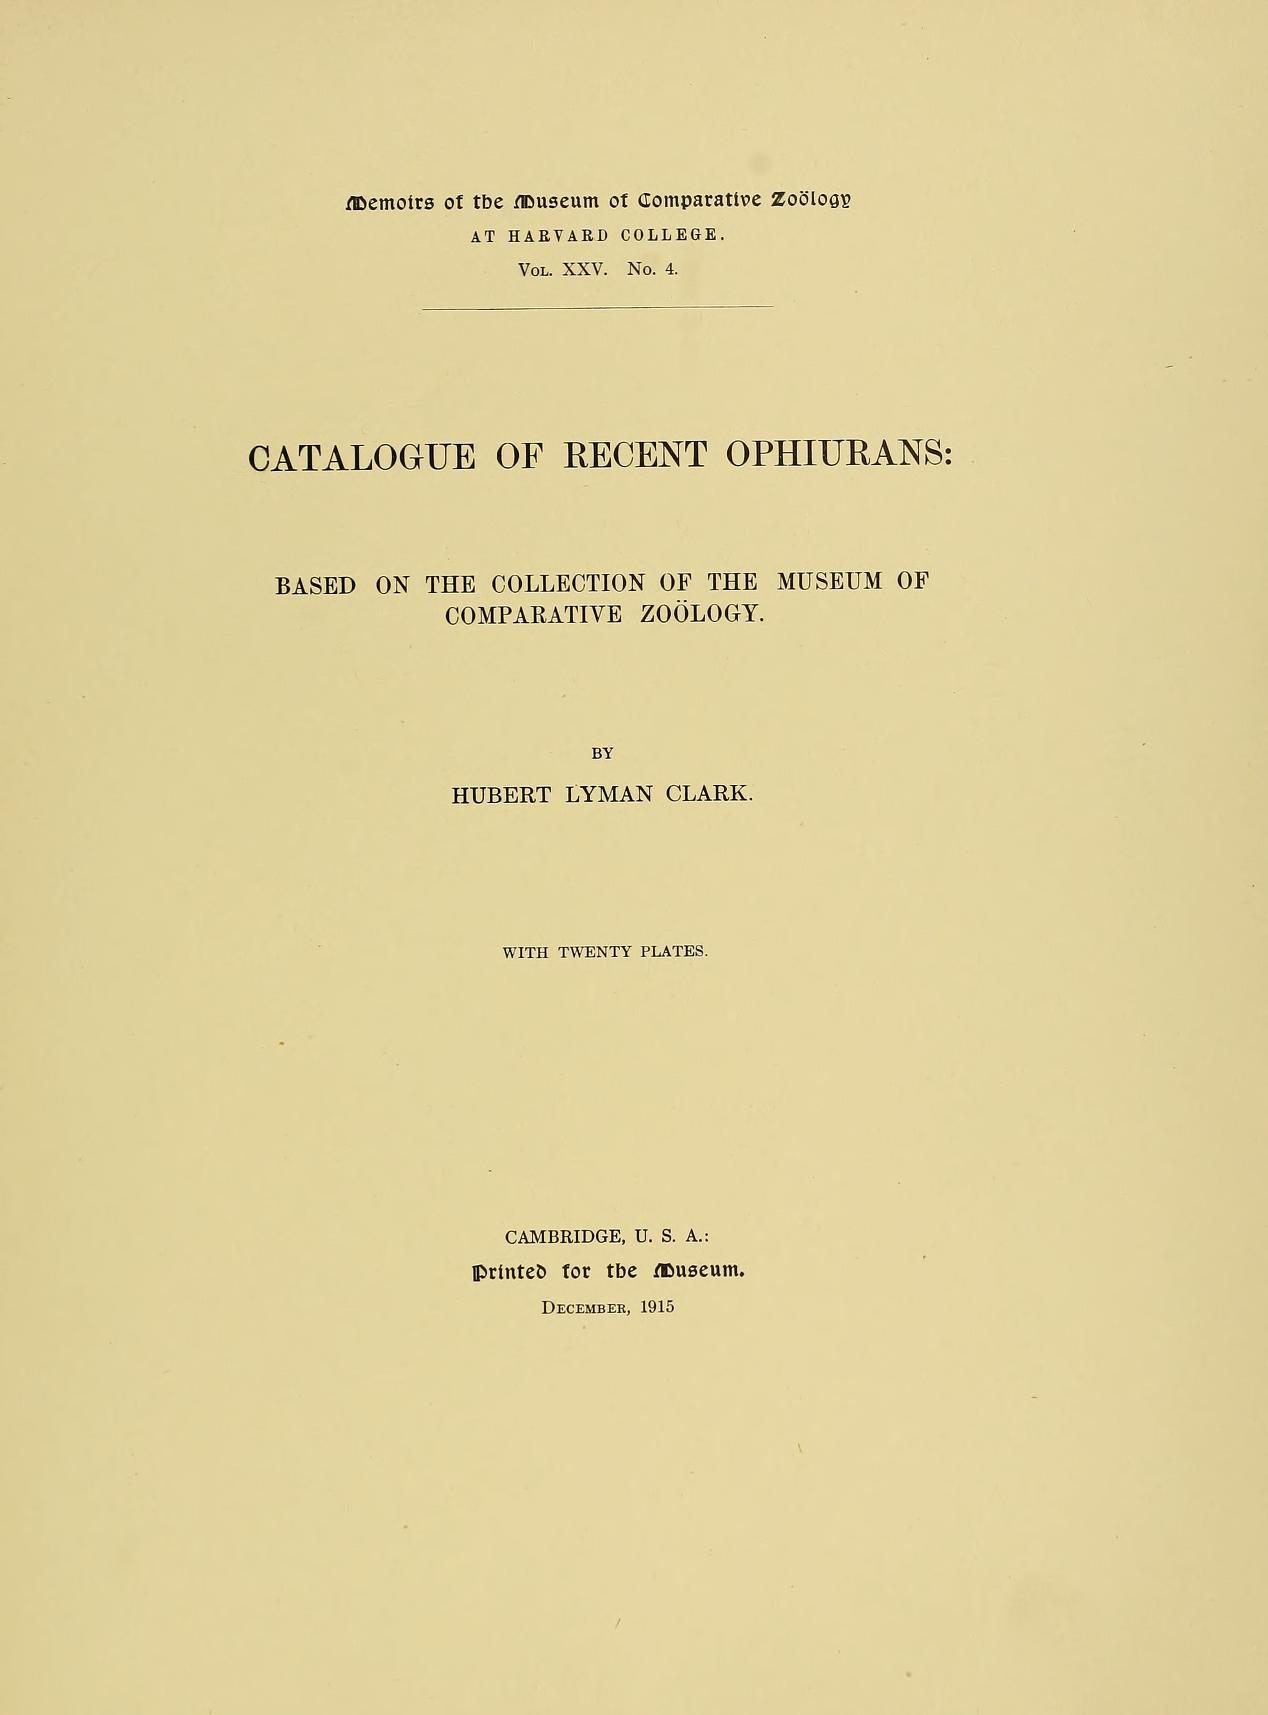 MCZ Memoirs Vol. XXV no. 4